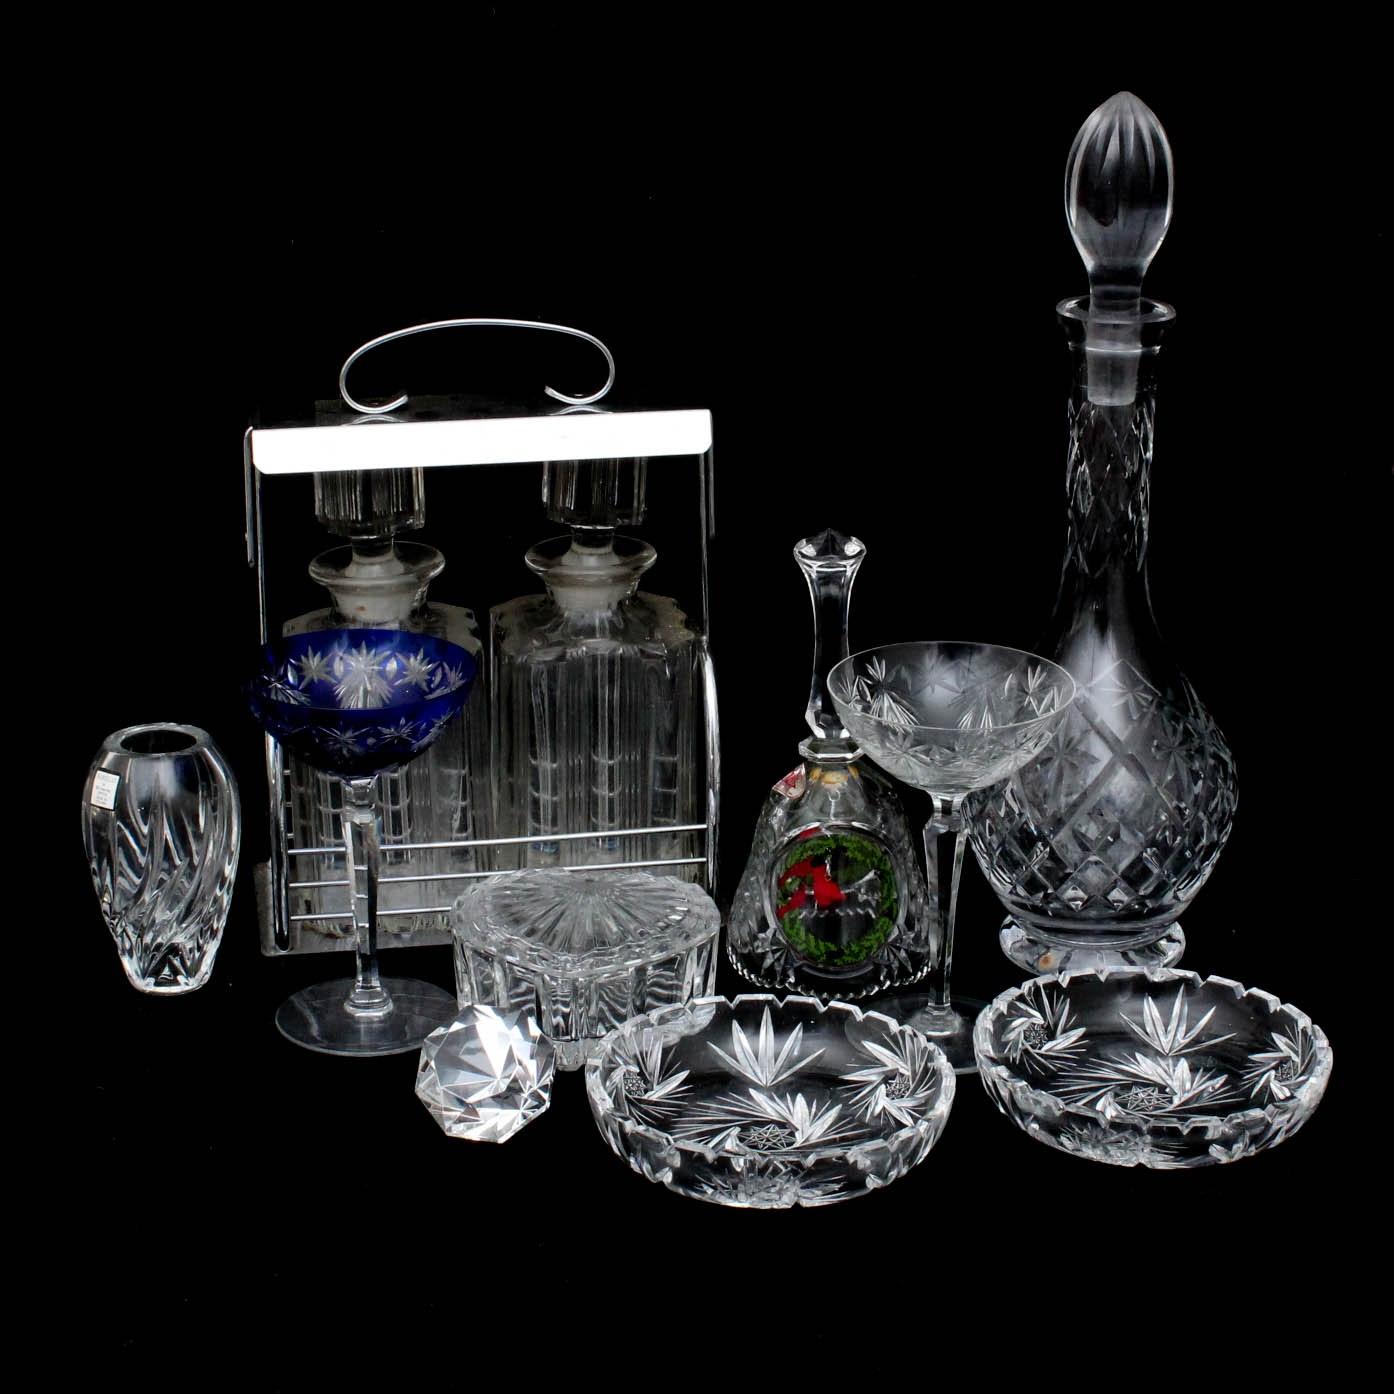 Crystal Barware and Decor